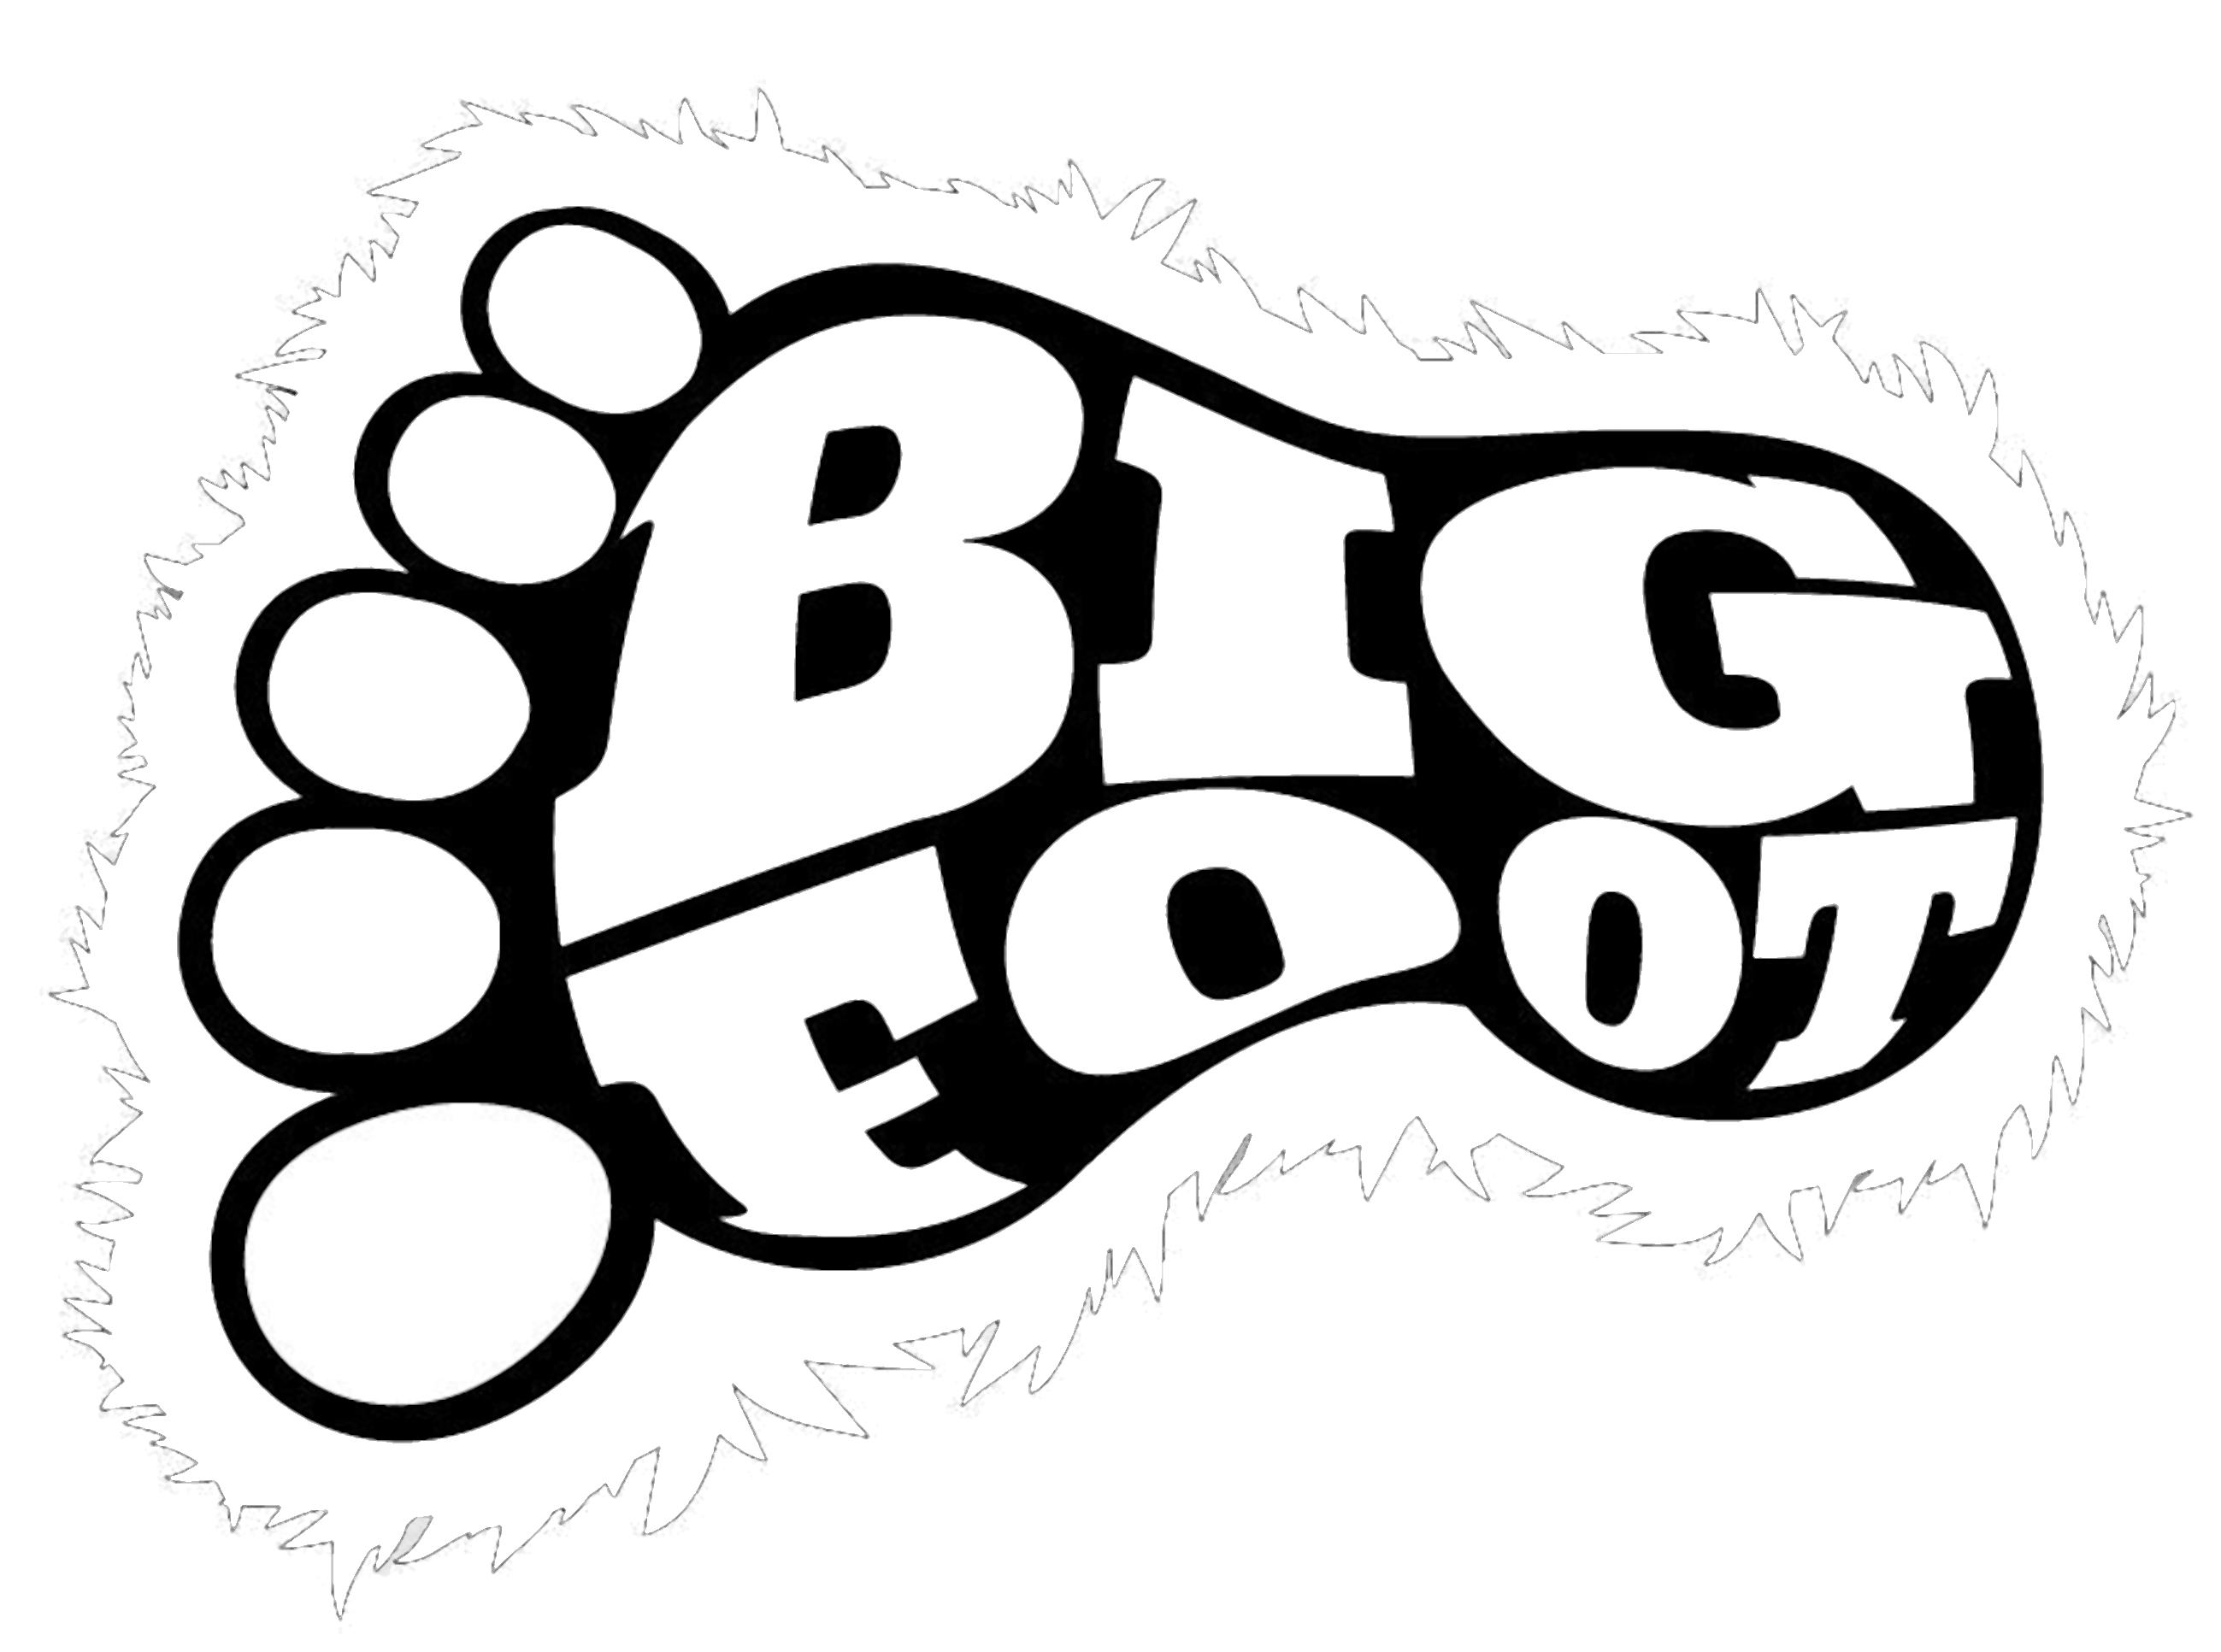 2 bigfoot stories this oregon blogger swears are true bigfoot rh pinterest com  free bigfoot clipart